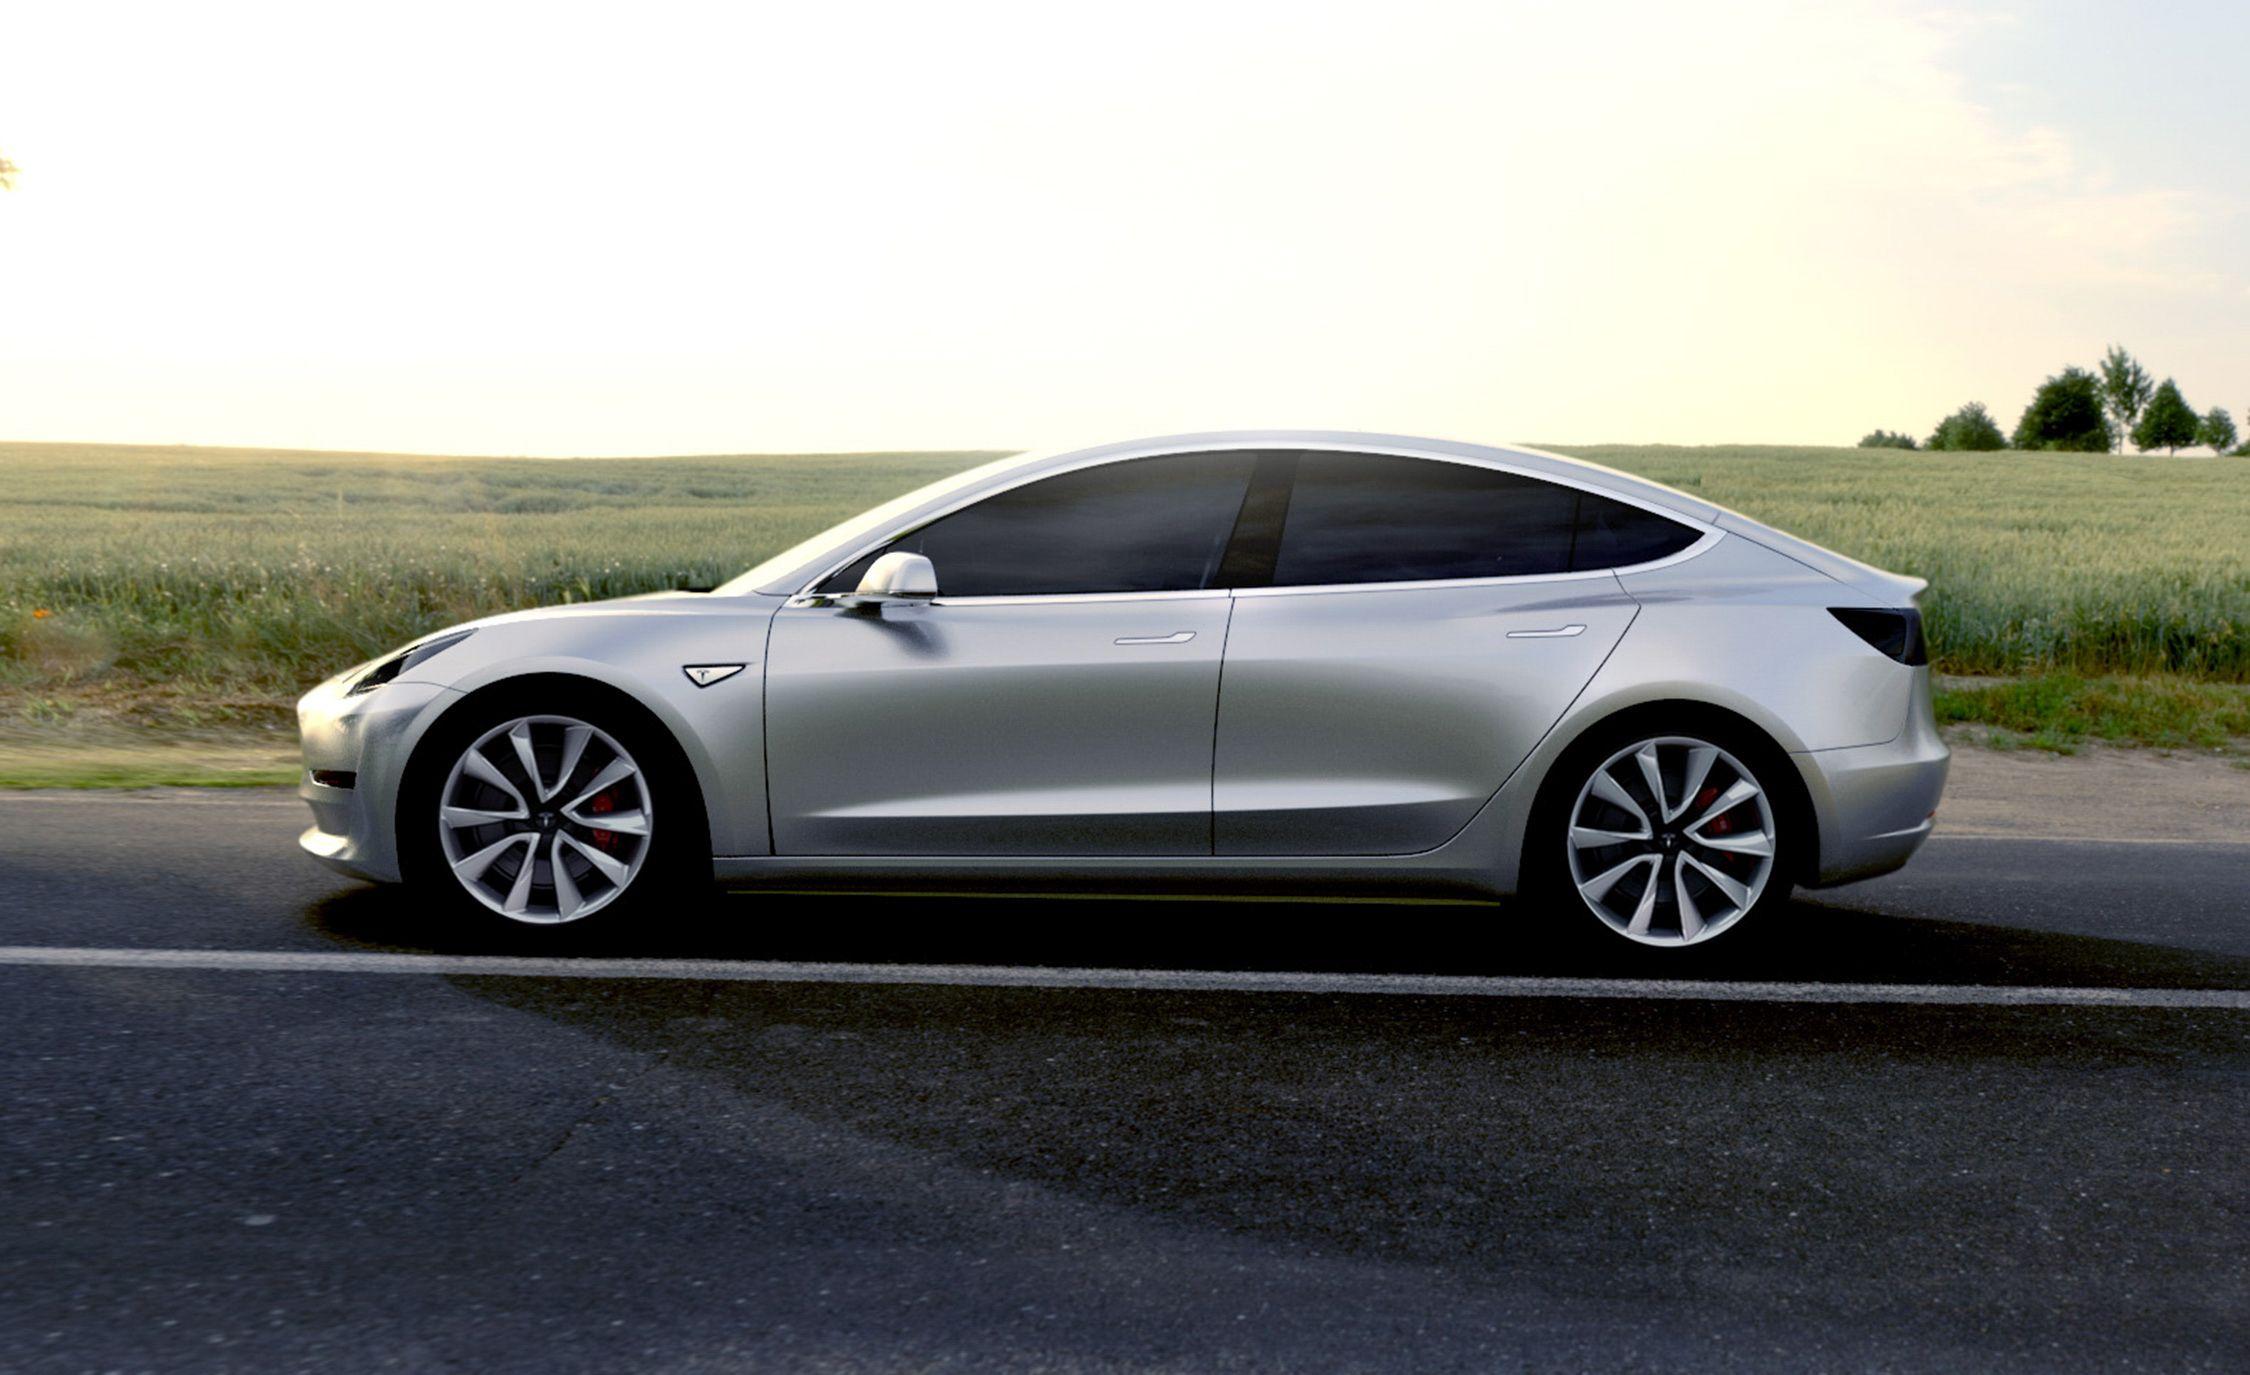 Tesla Model Reviews Tesla Model Price Photos And Specs - Automobil tesla